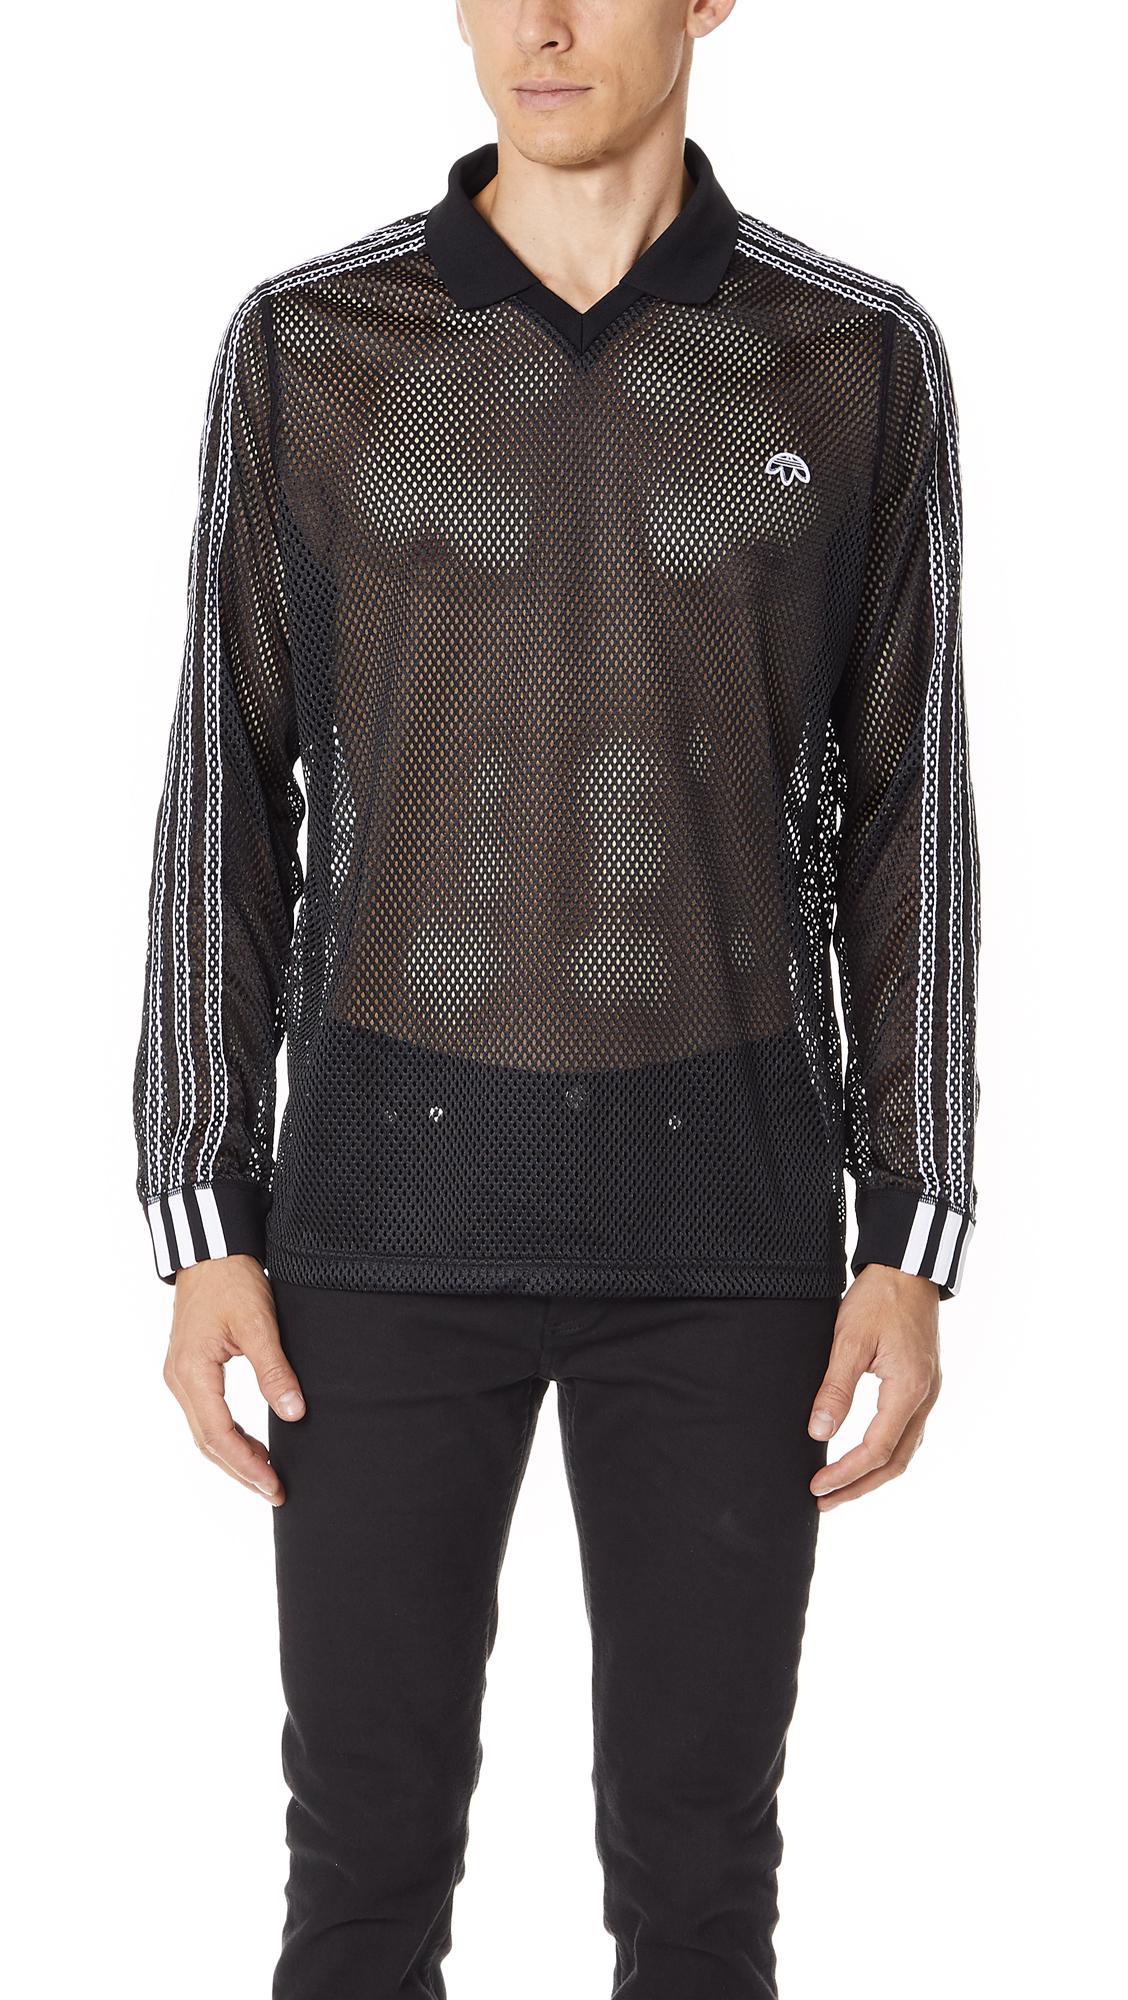 61afdb49ef5c Adidas Originals By Alexander Wang Adidas By Alexander Wang Long Sleeve  Mesh Polo In Black